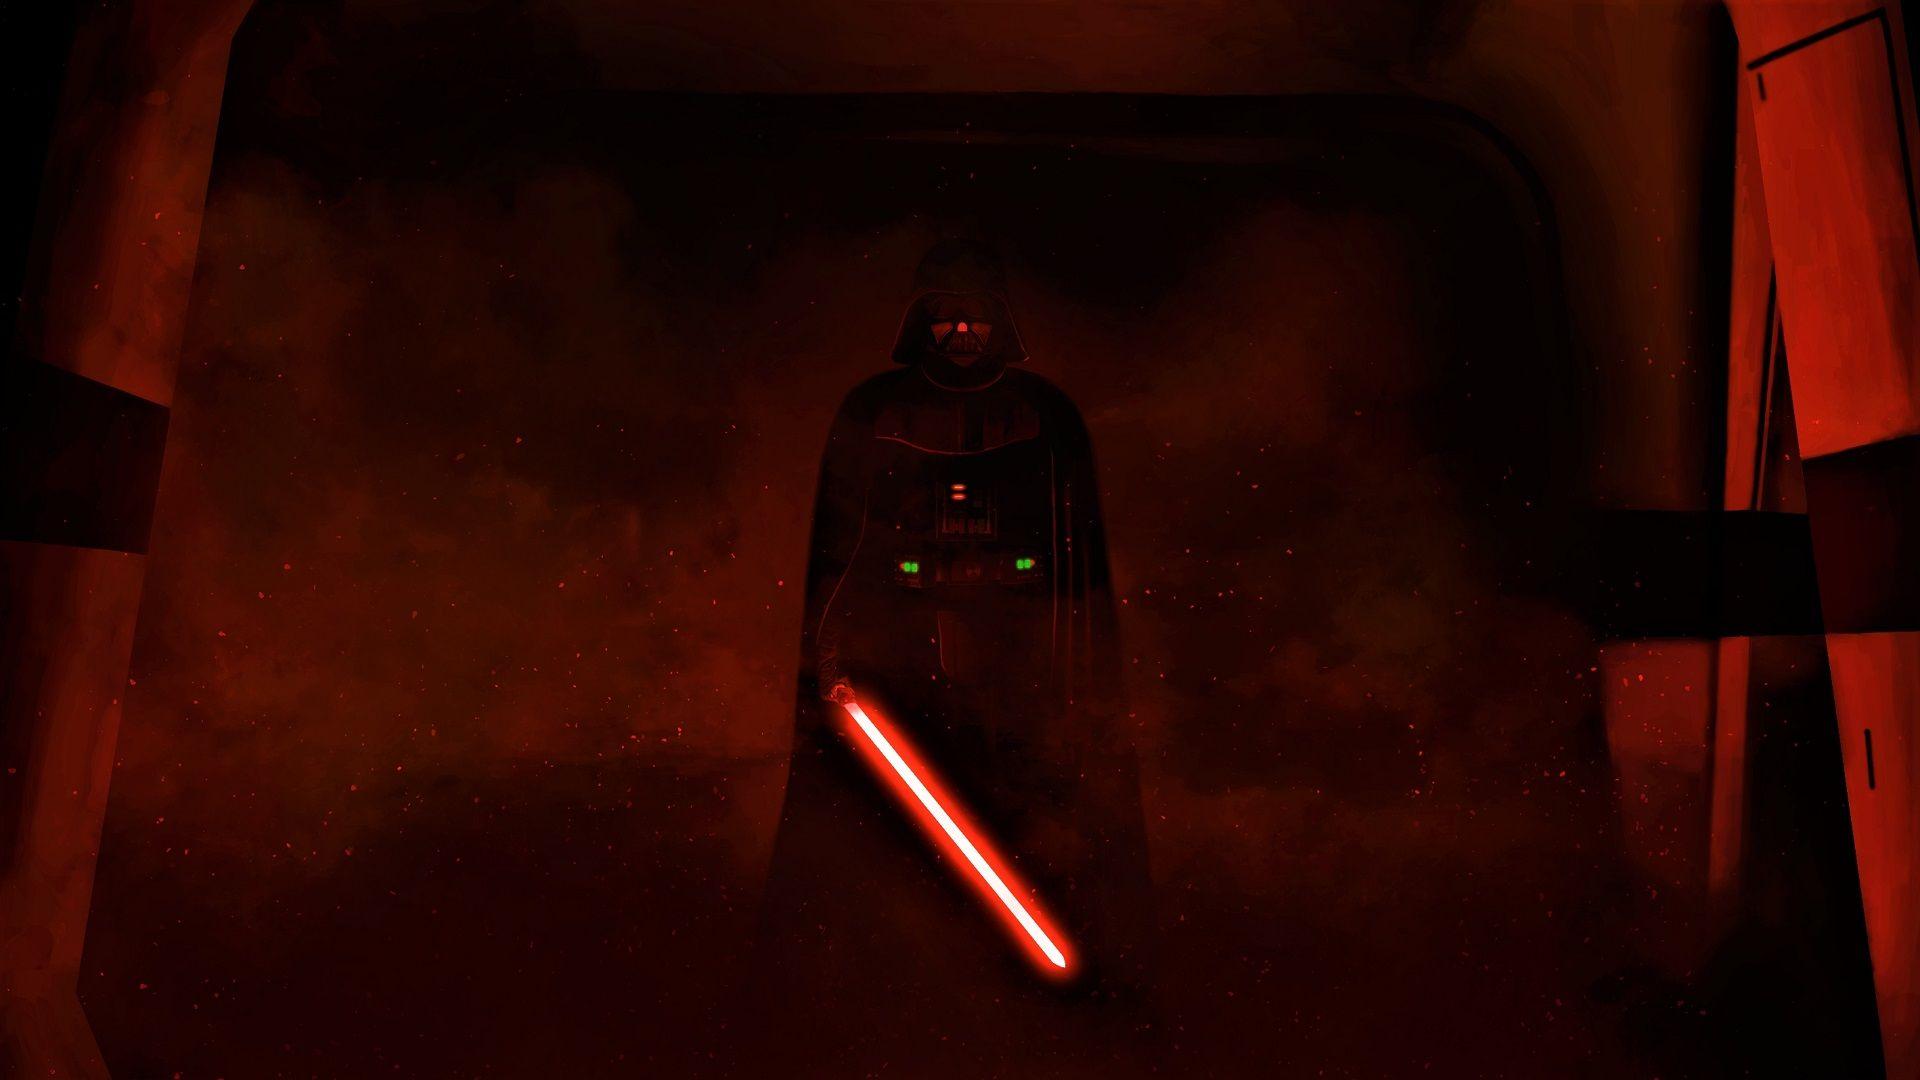 Darth Vader People Star Wars Artwork Lightsaber Star Wars Villains Wallpaper No 600016 W Star Wars Wallpaper Darth Vader Wallpaper Hd Wallpaper